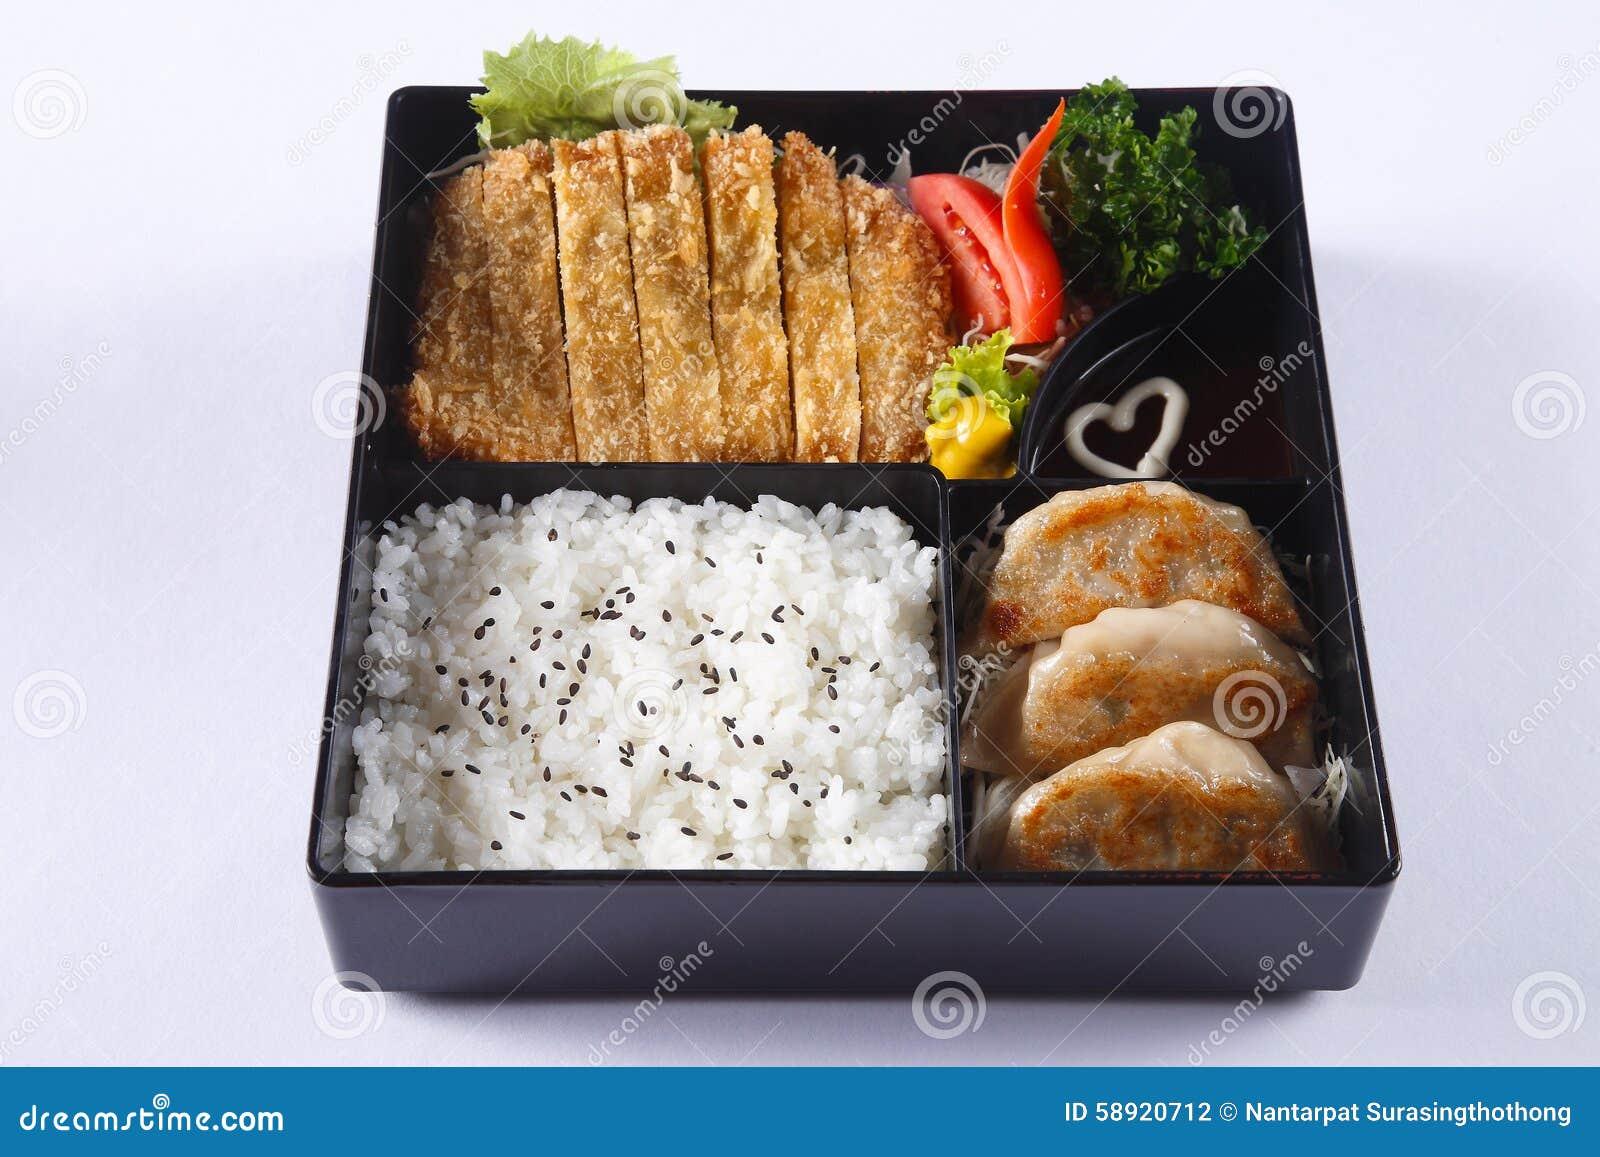 Insieme di bento della carne di maiale Deep fried (Tonkatsu), Gyoza, riso giapponese, i